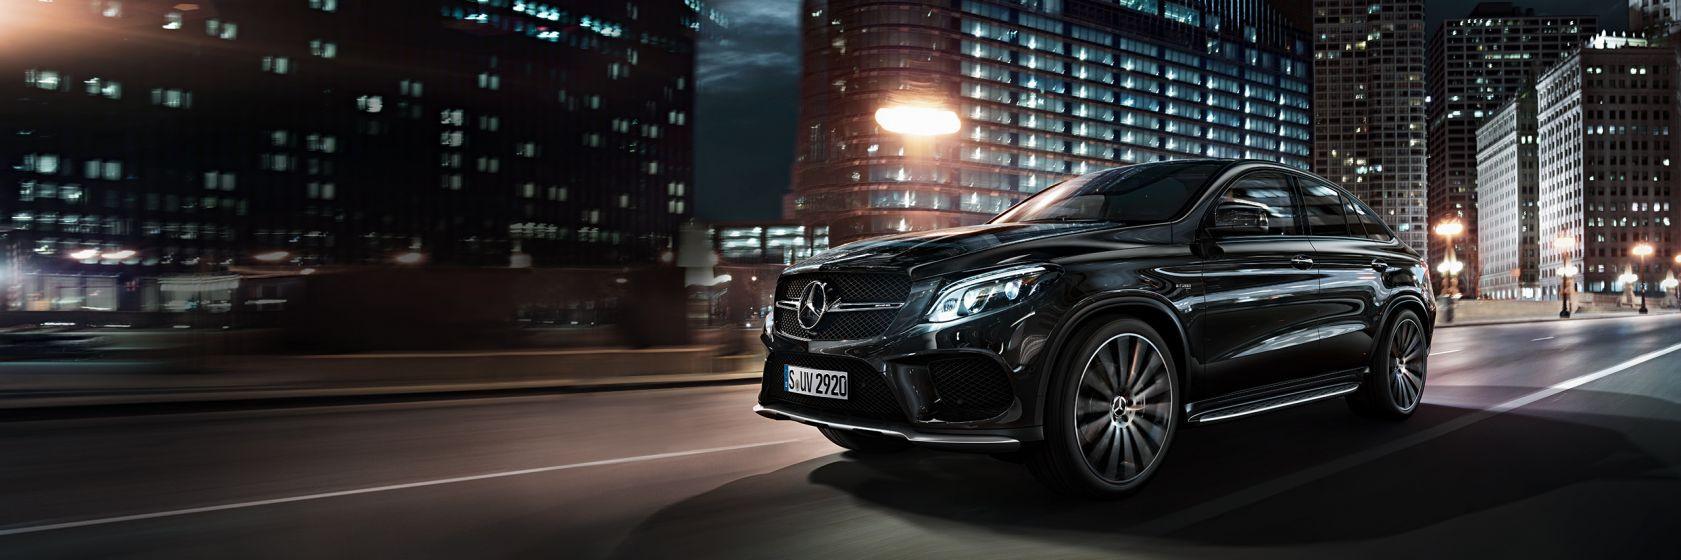 Mercedes gle negro